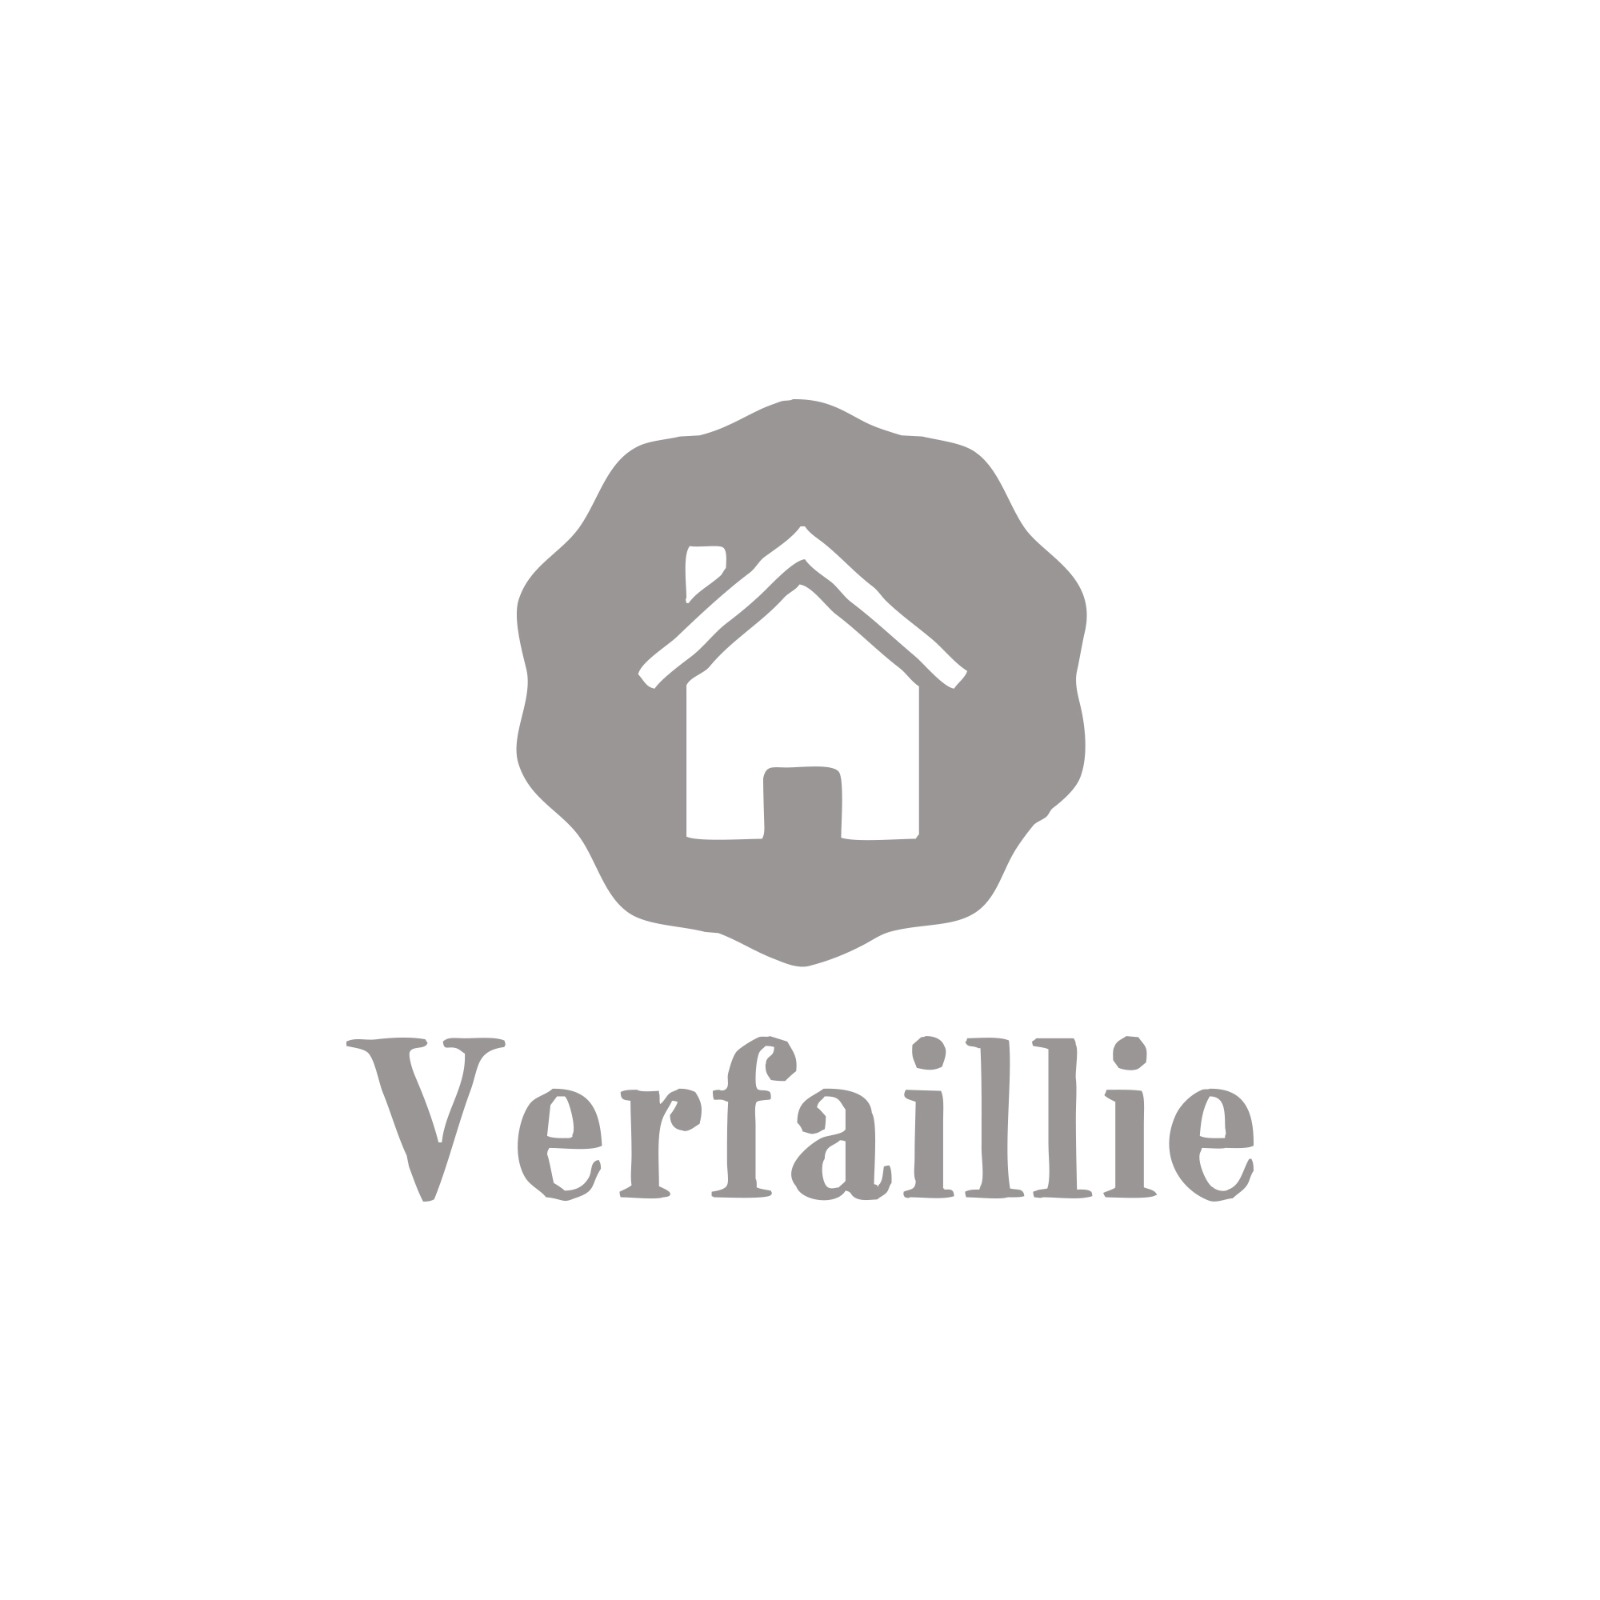 Verfaillie